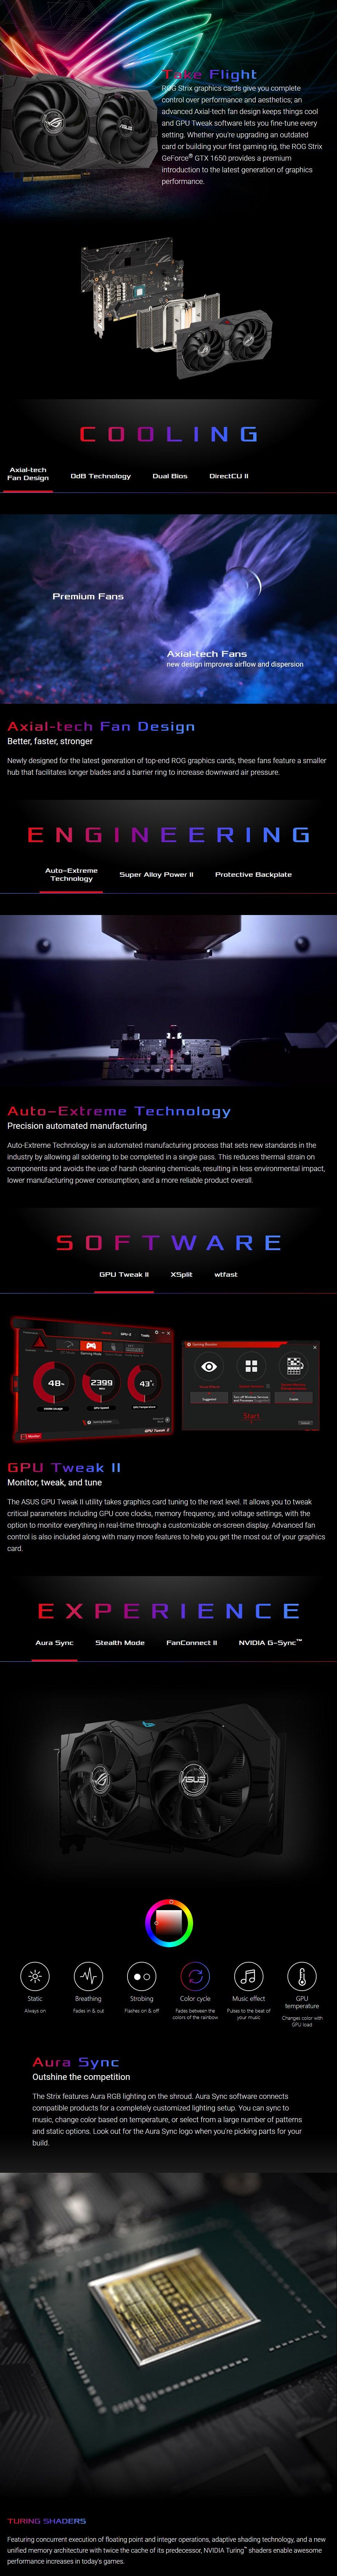 ASUS GeForce GTX 1650 ROG Strix OC 4GB GDDR6 Video Card - Overview 1